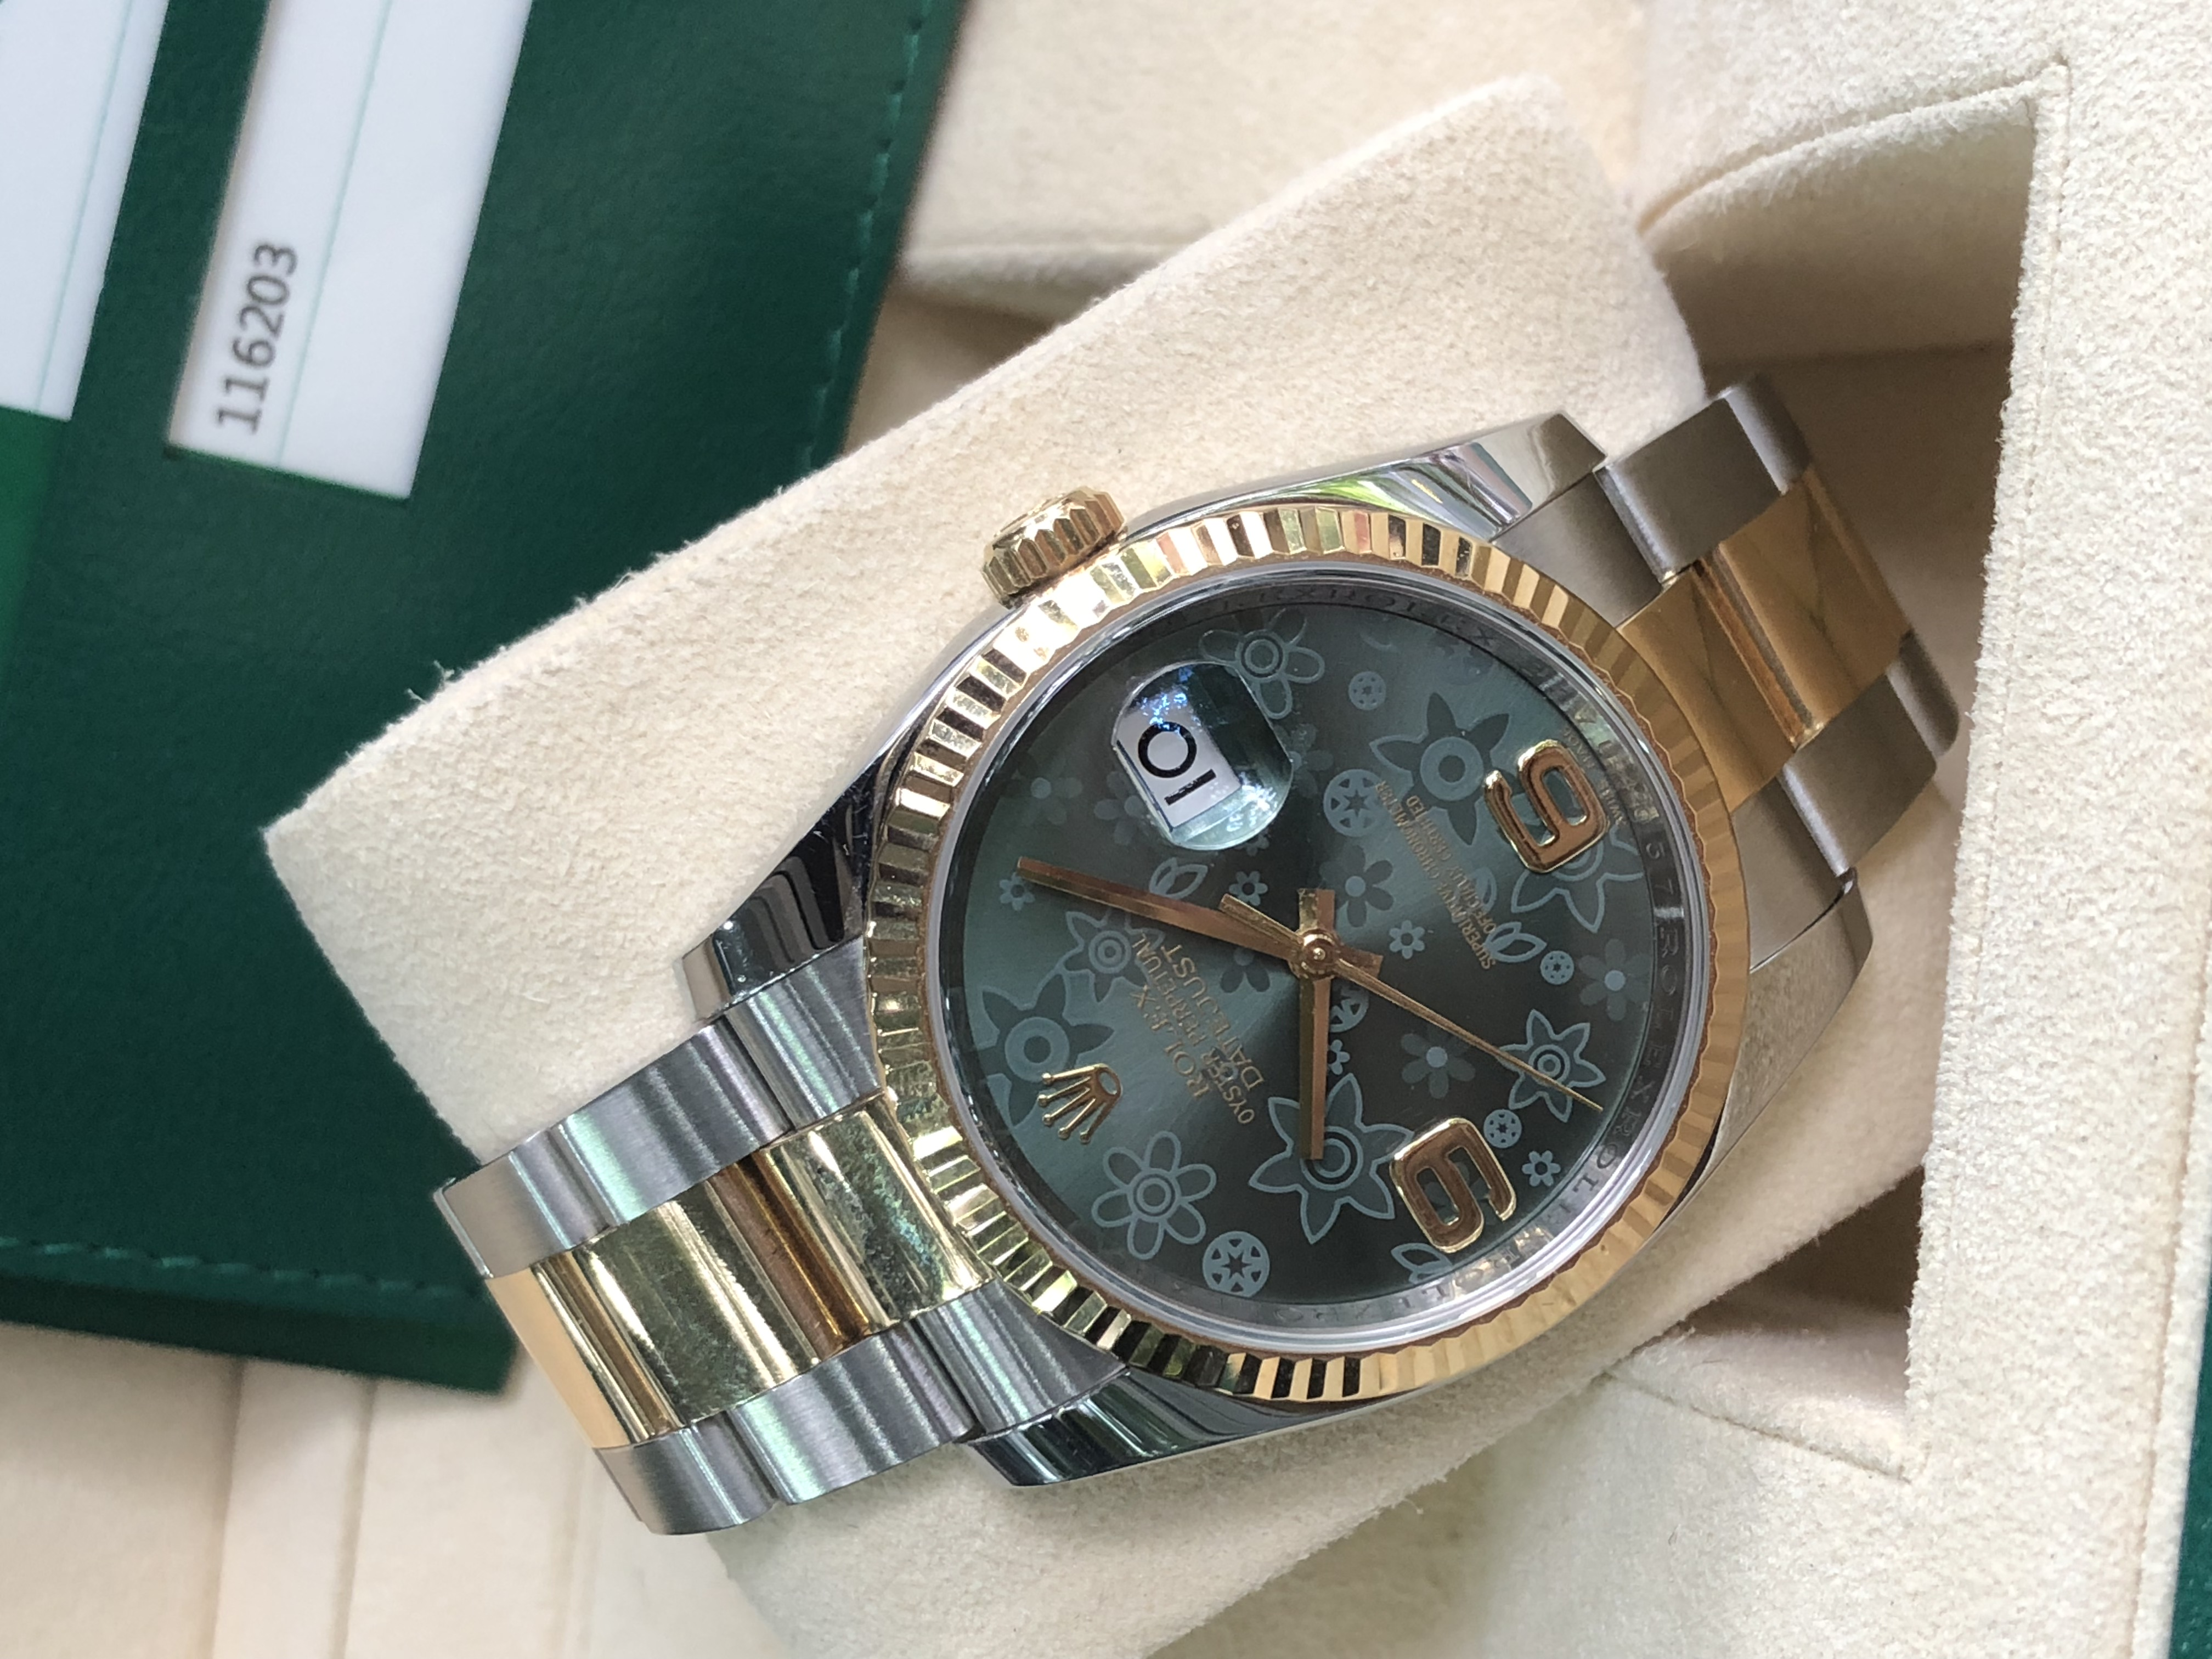 Rolex 116203 mặt đá xanh sản xuất năm 2016 fullbox